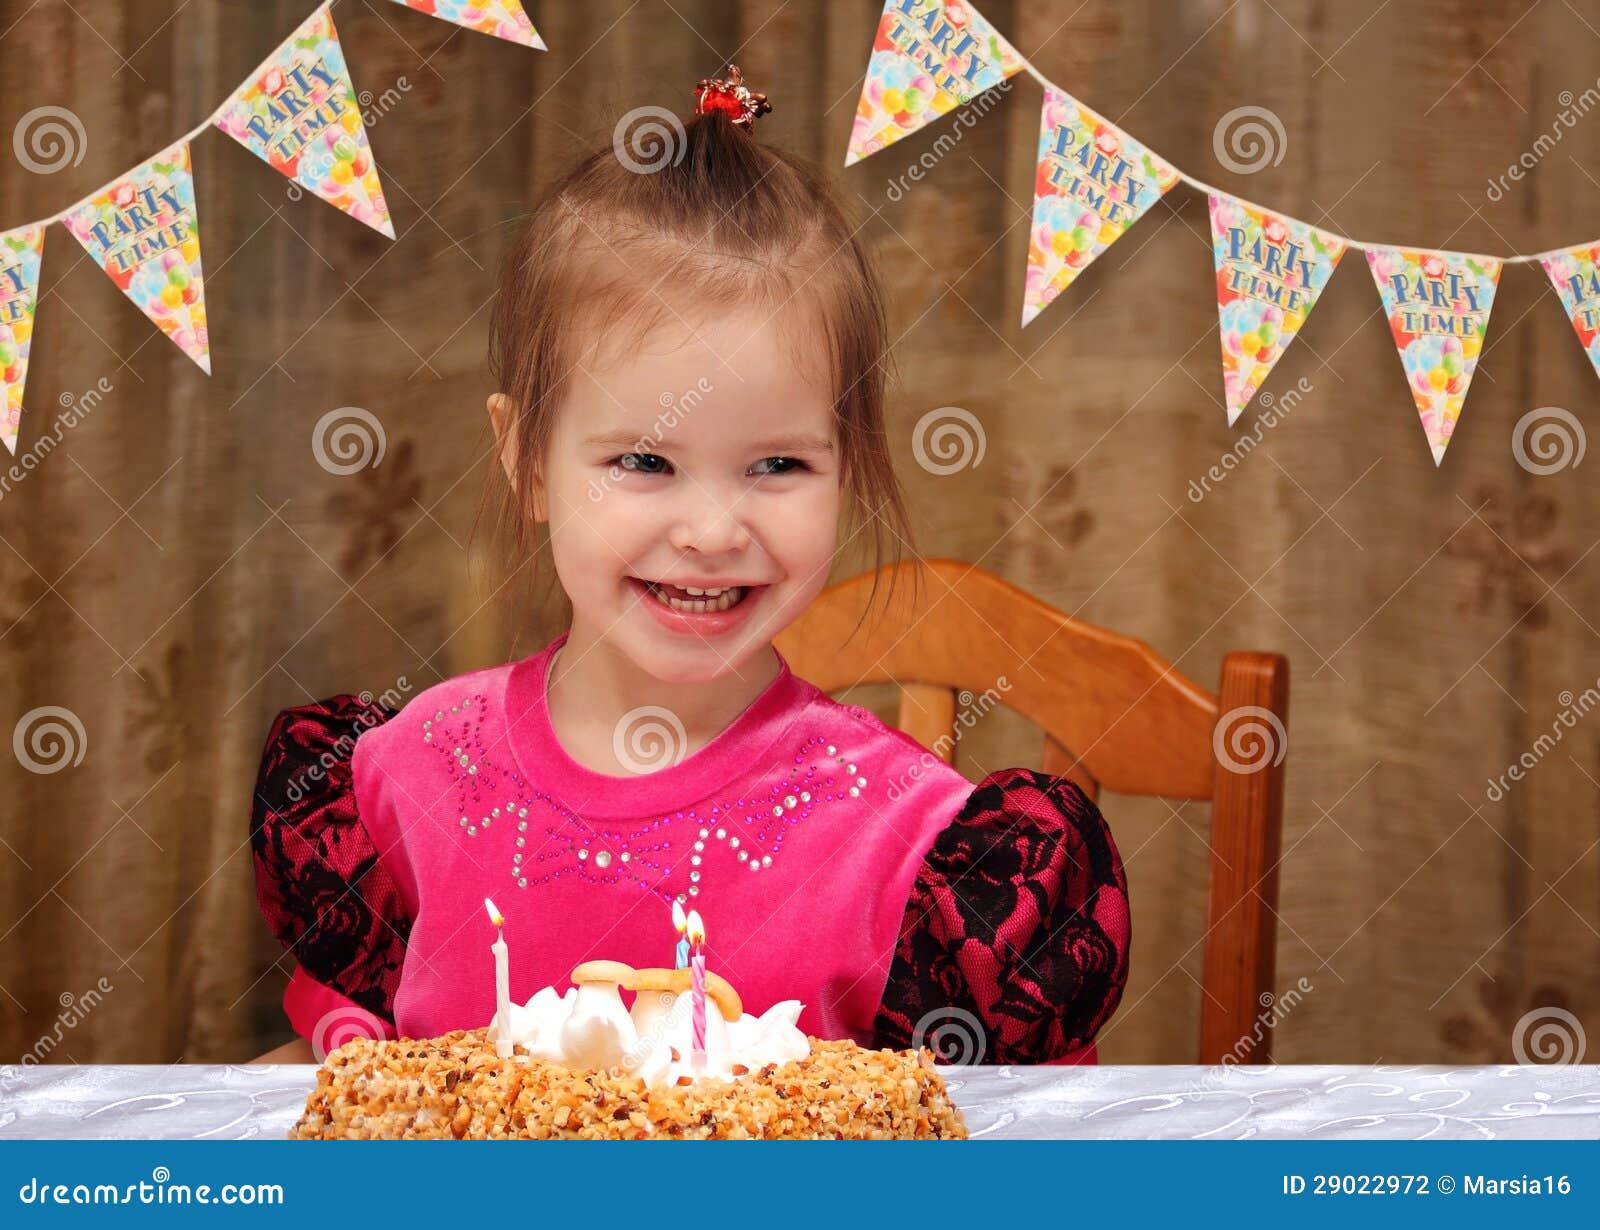 Happy three year old girl birthday